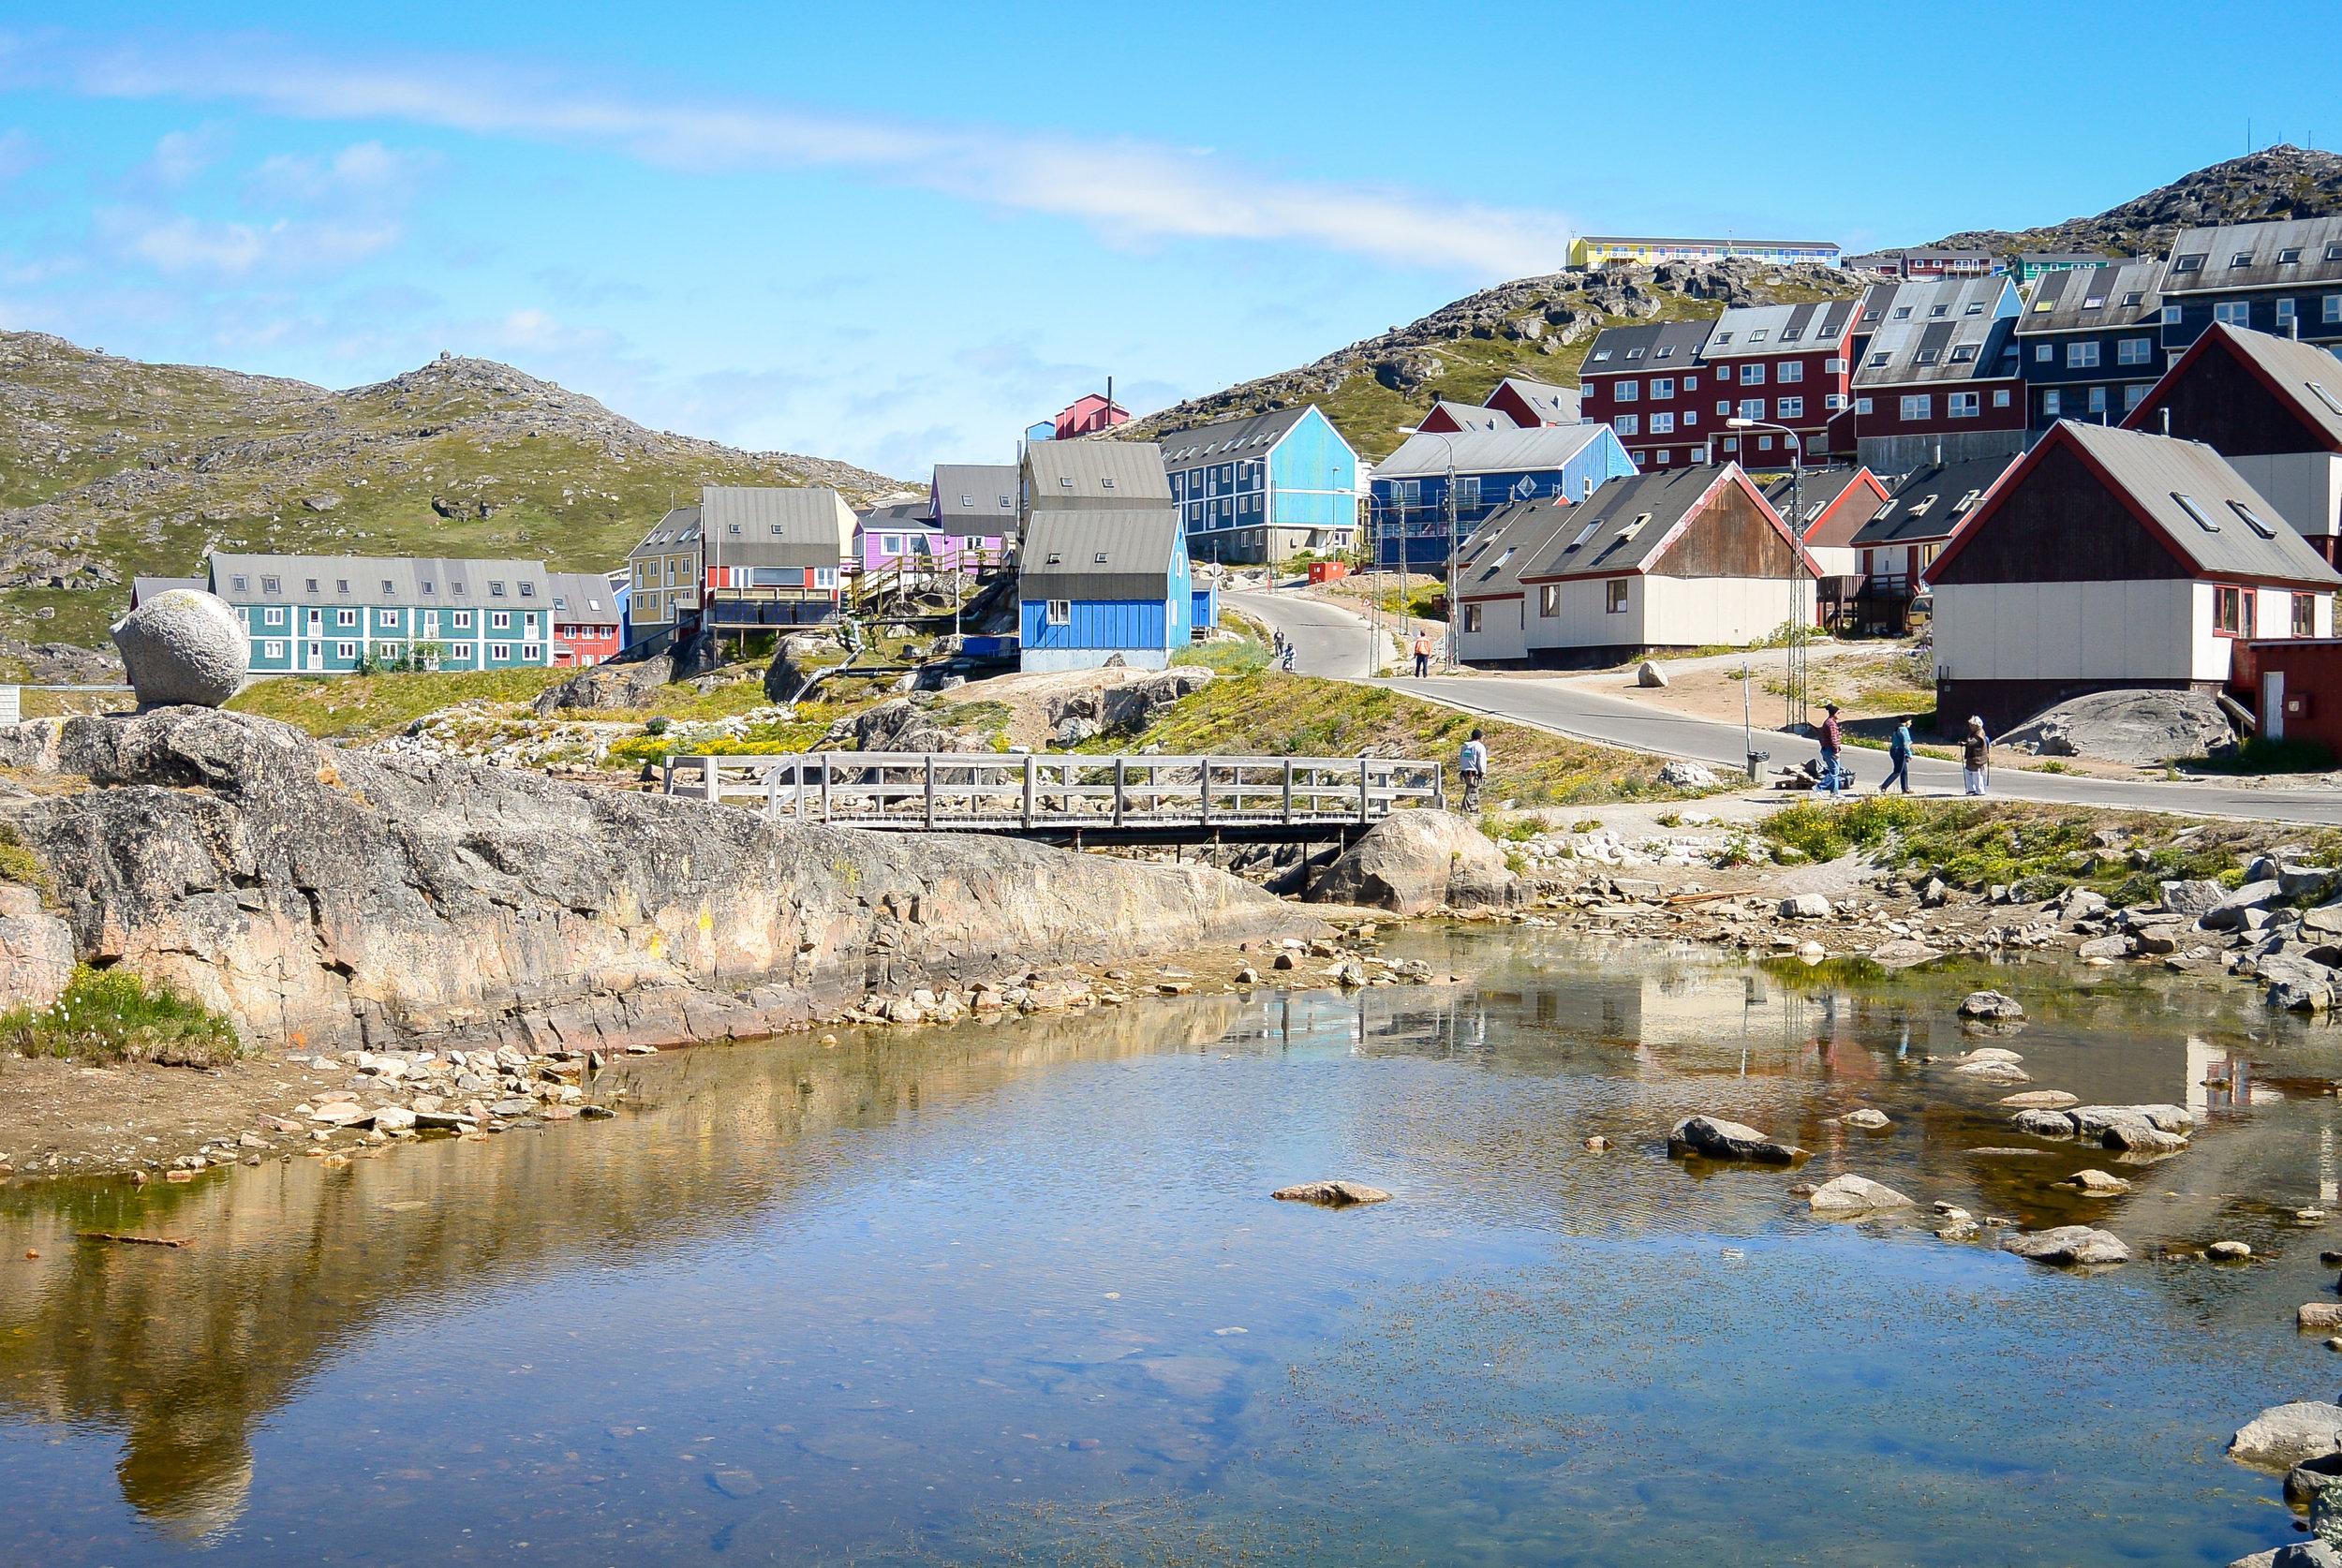 Colorful houses in Qaqortoq